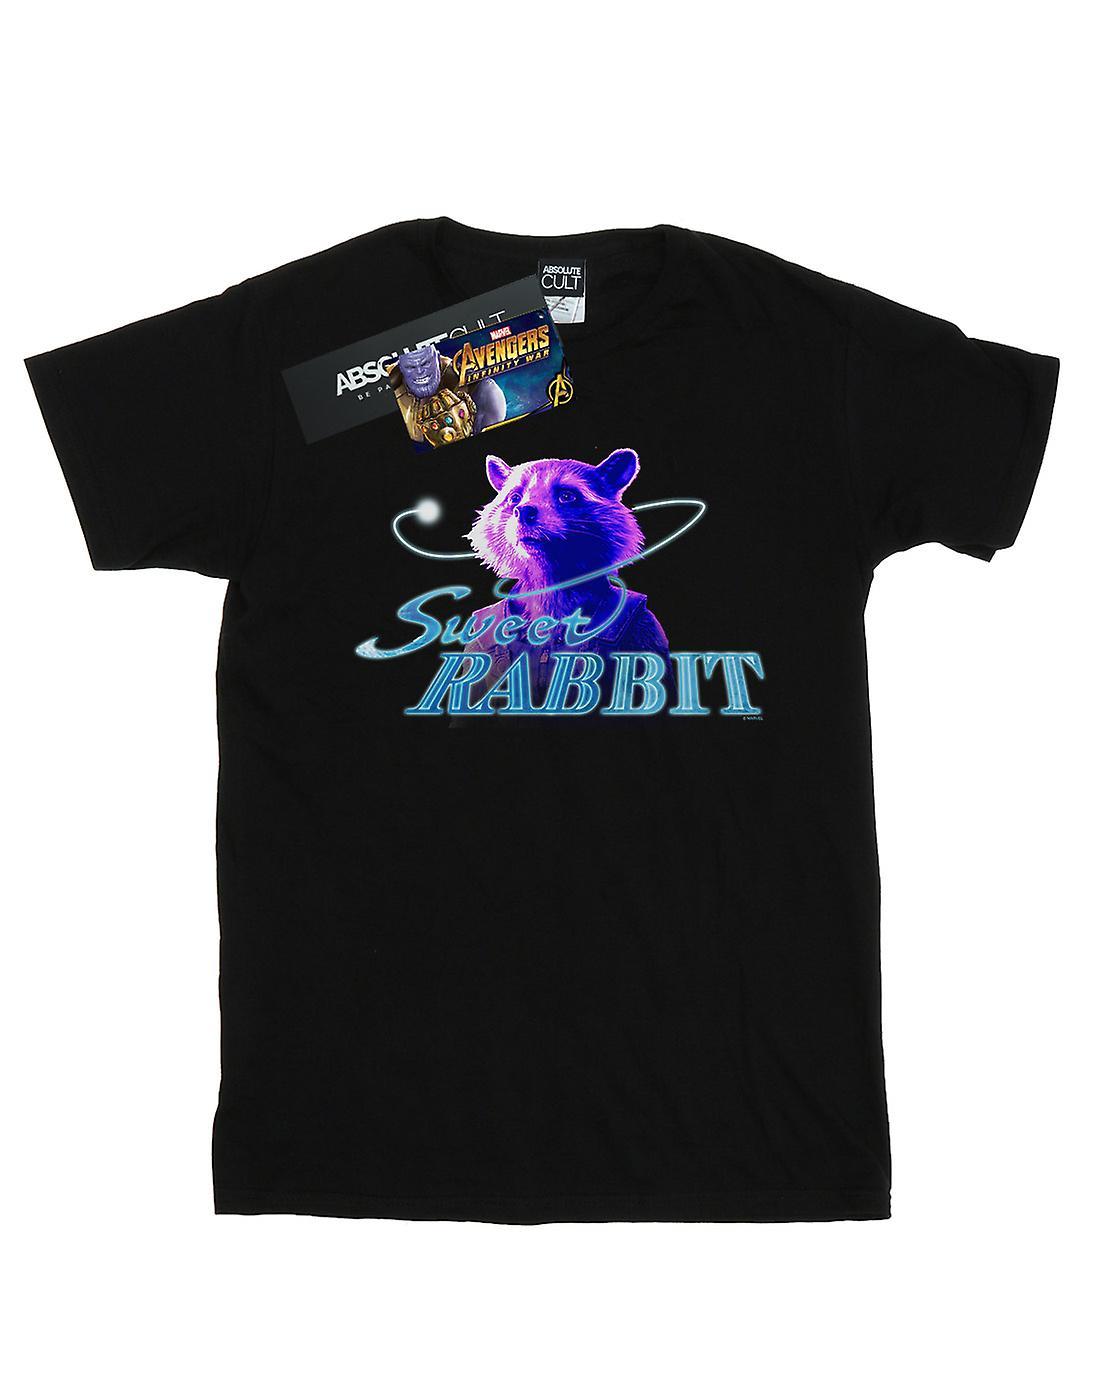 Marvel Women's Avengers Infinity War Sweet Rabbit Boyfriend Fit T-Shirt